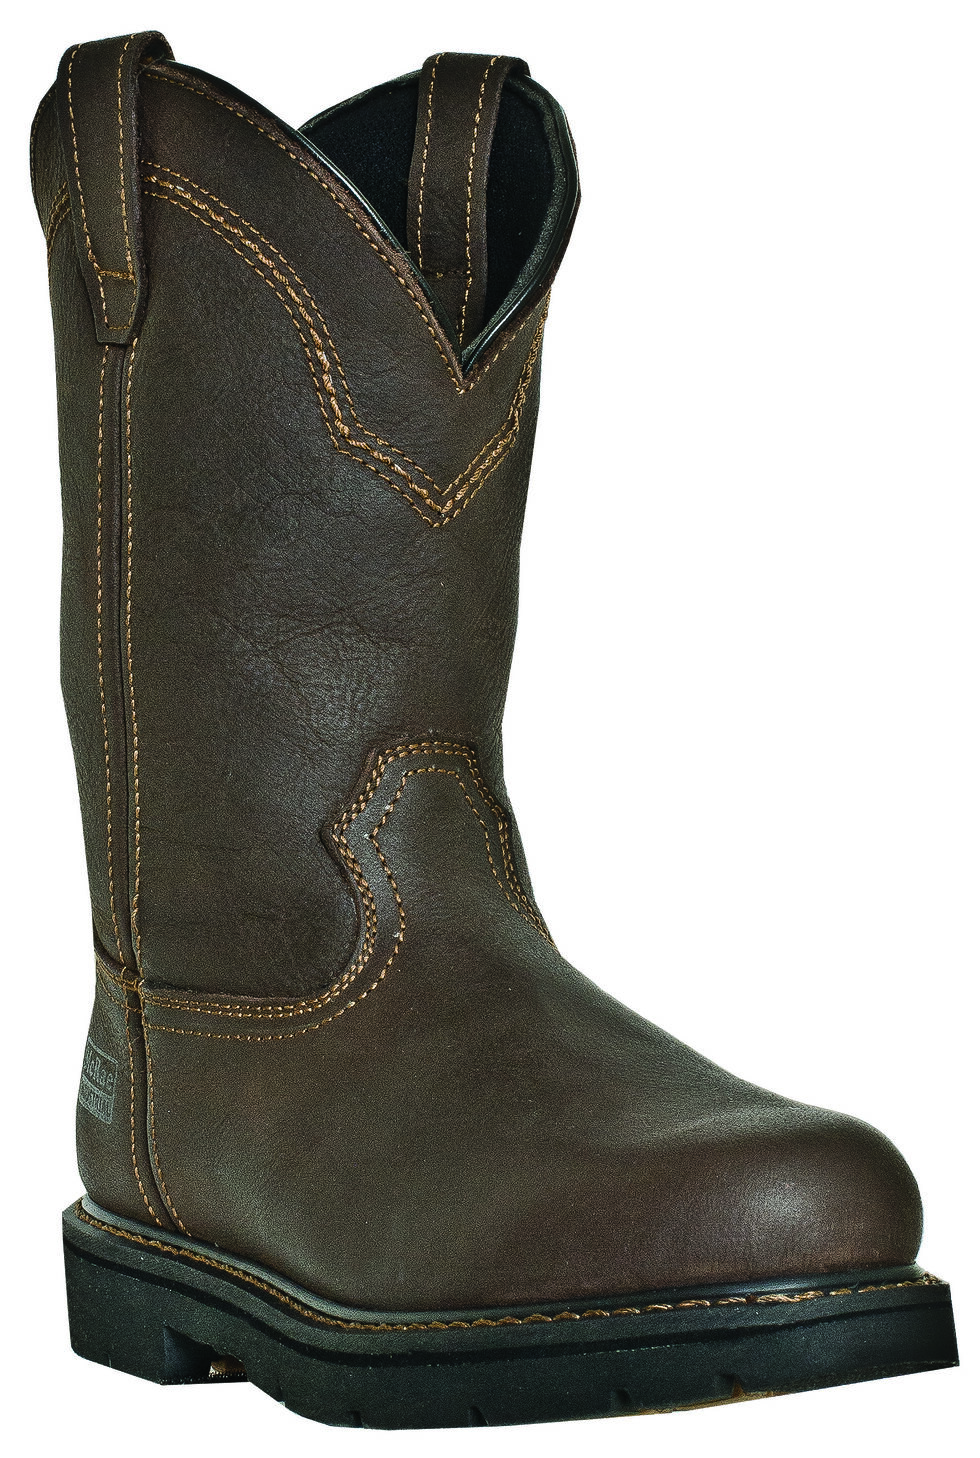 McRae Men's Pull-On Work Boots - Steel Toe, Brown, hi-res